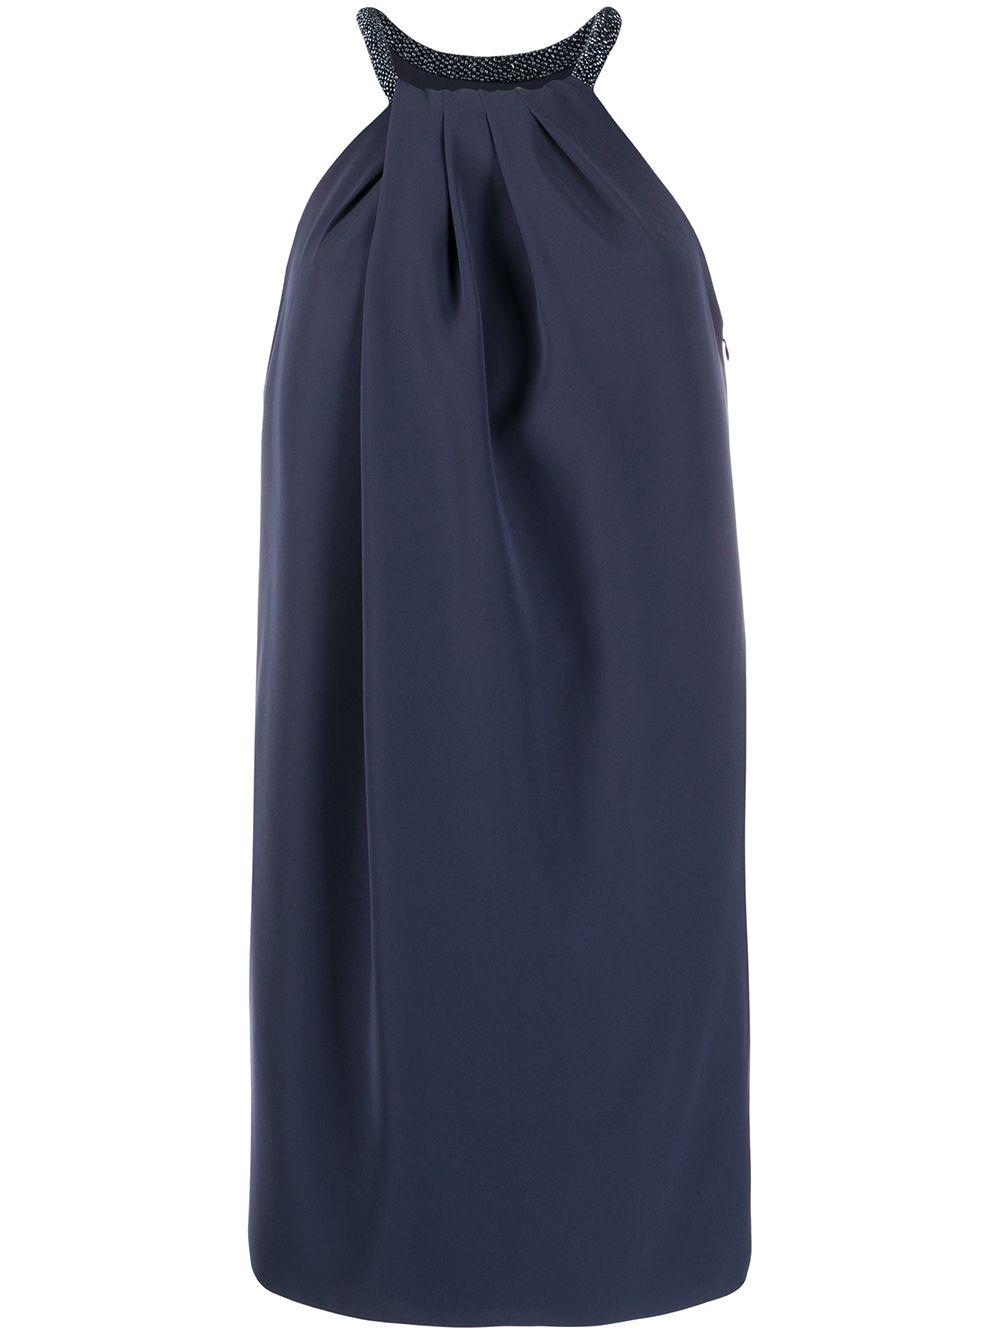 Tecno Cady Short Dress